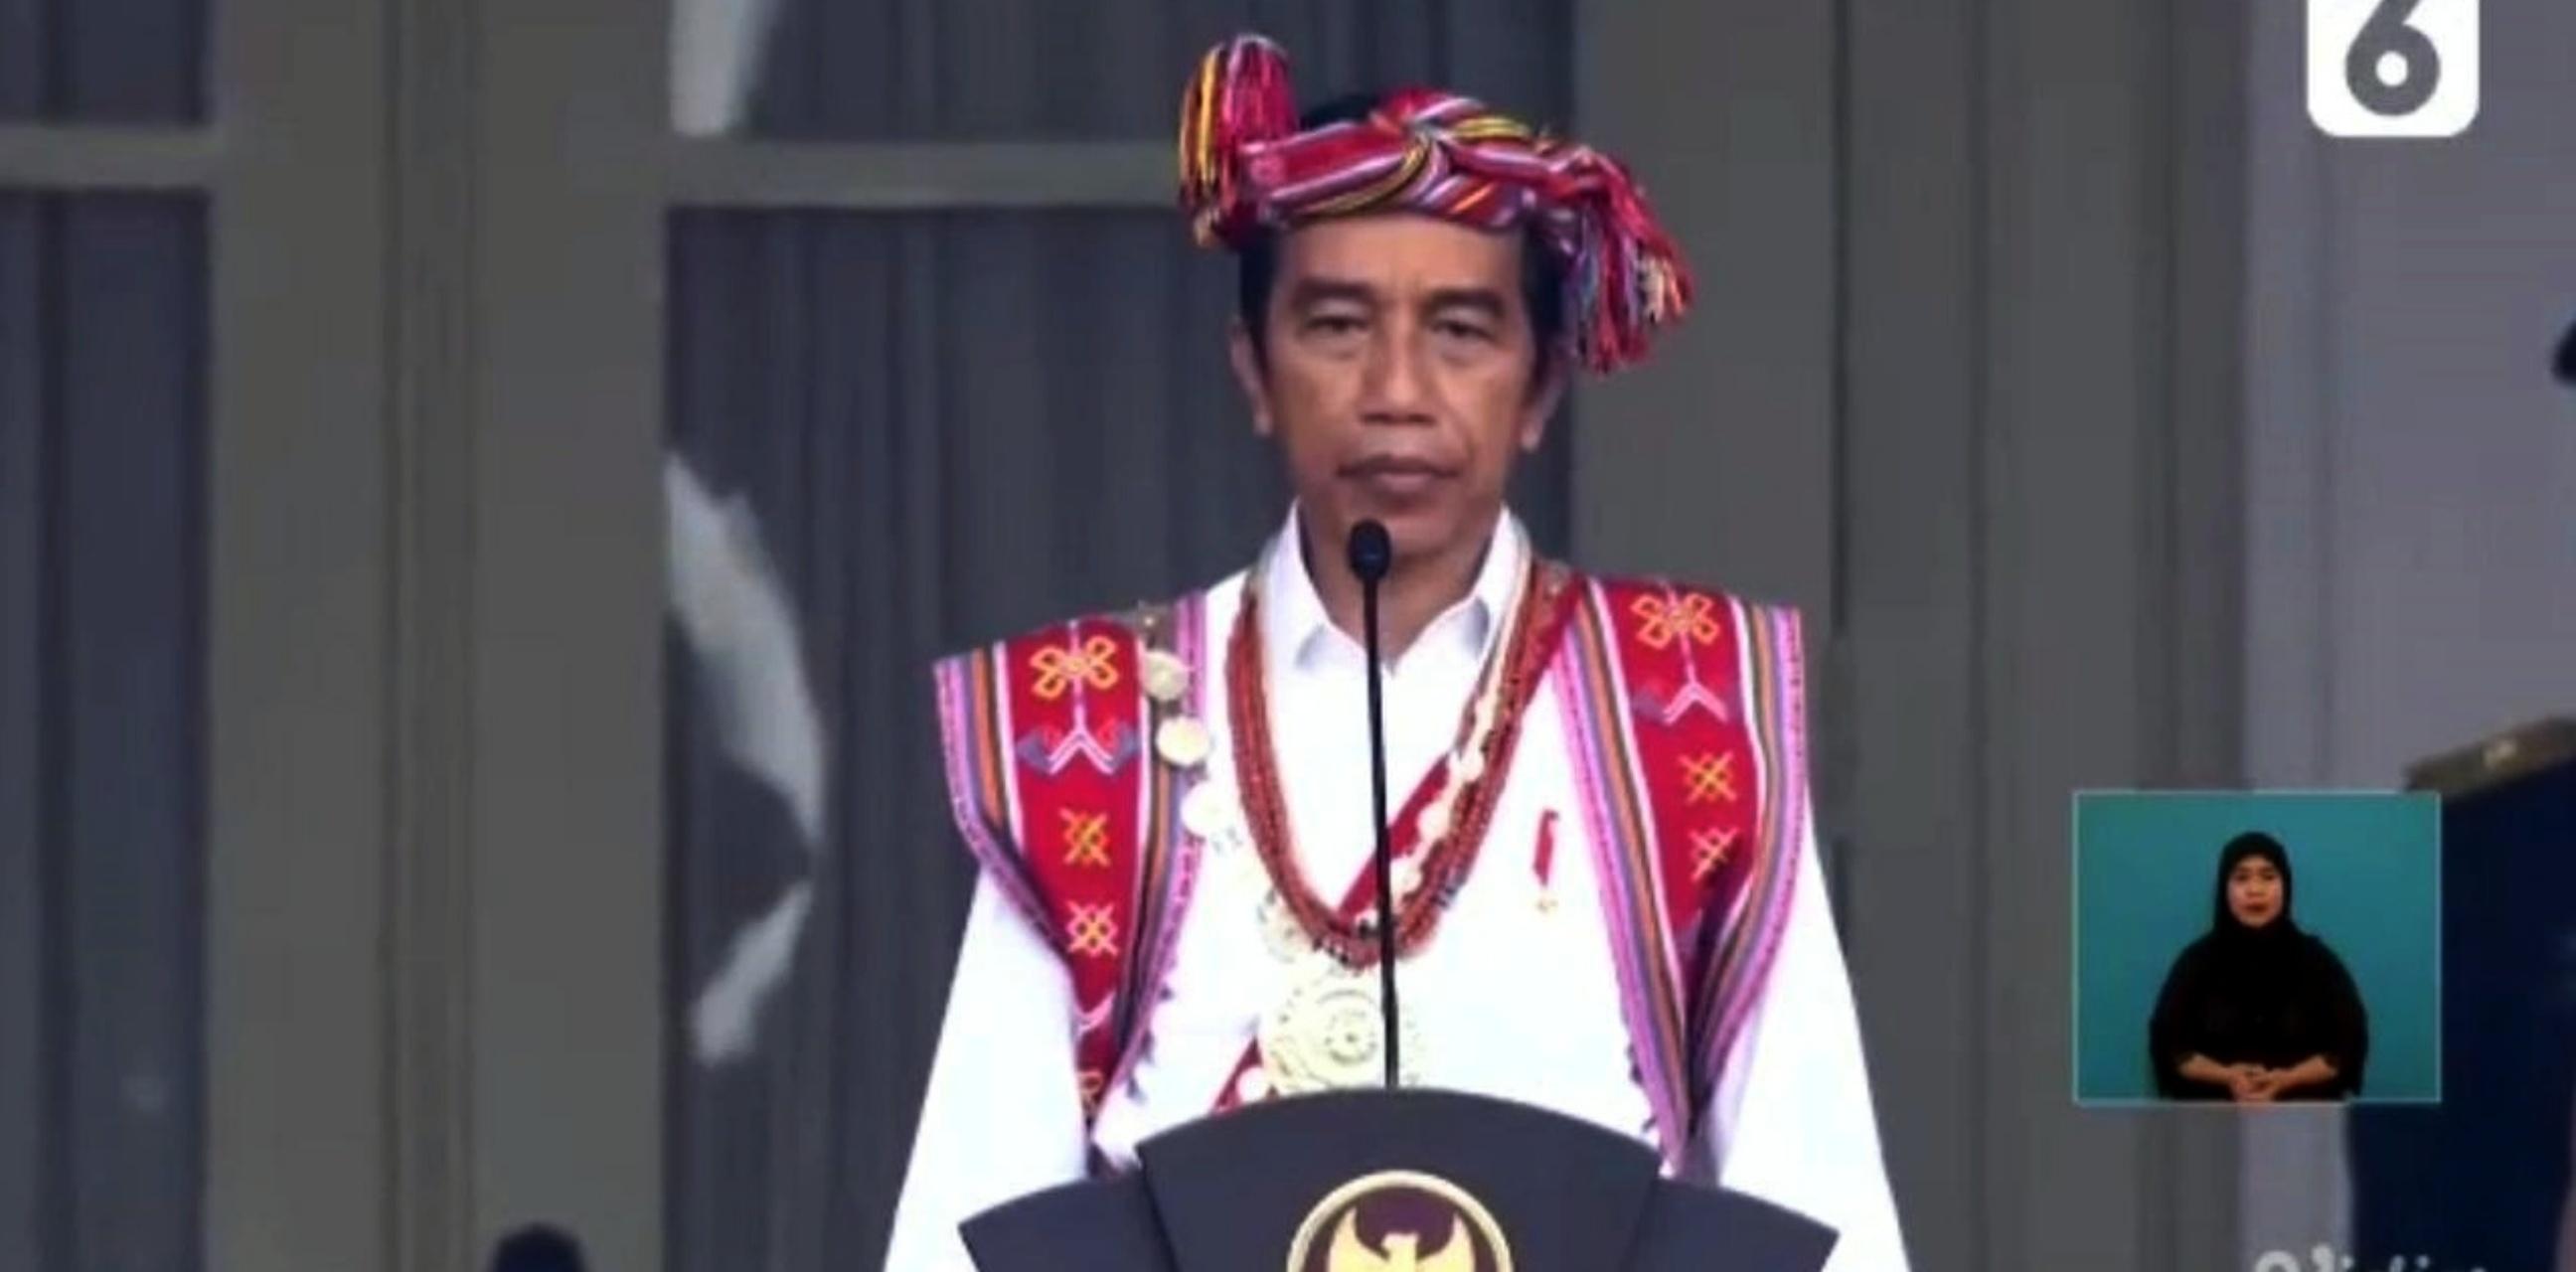 Fakta dibalik baju adat Presiden Jokowi pada upacara HUT RI Ke-75